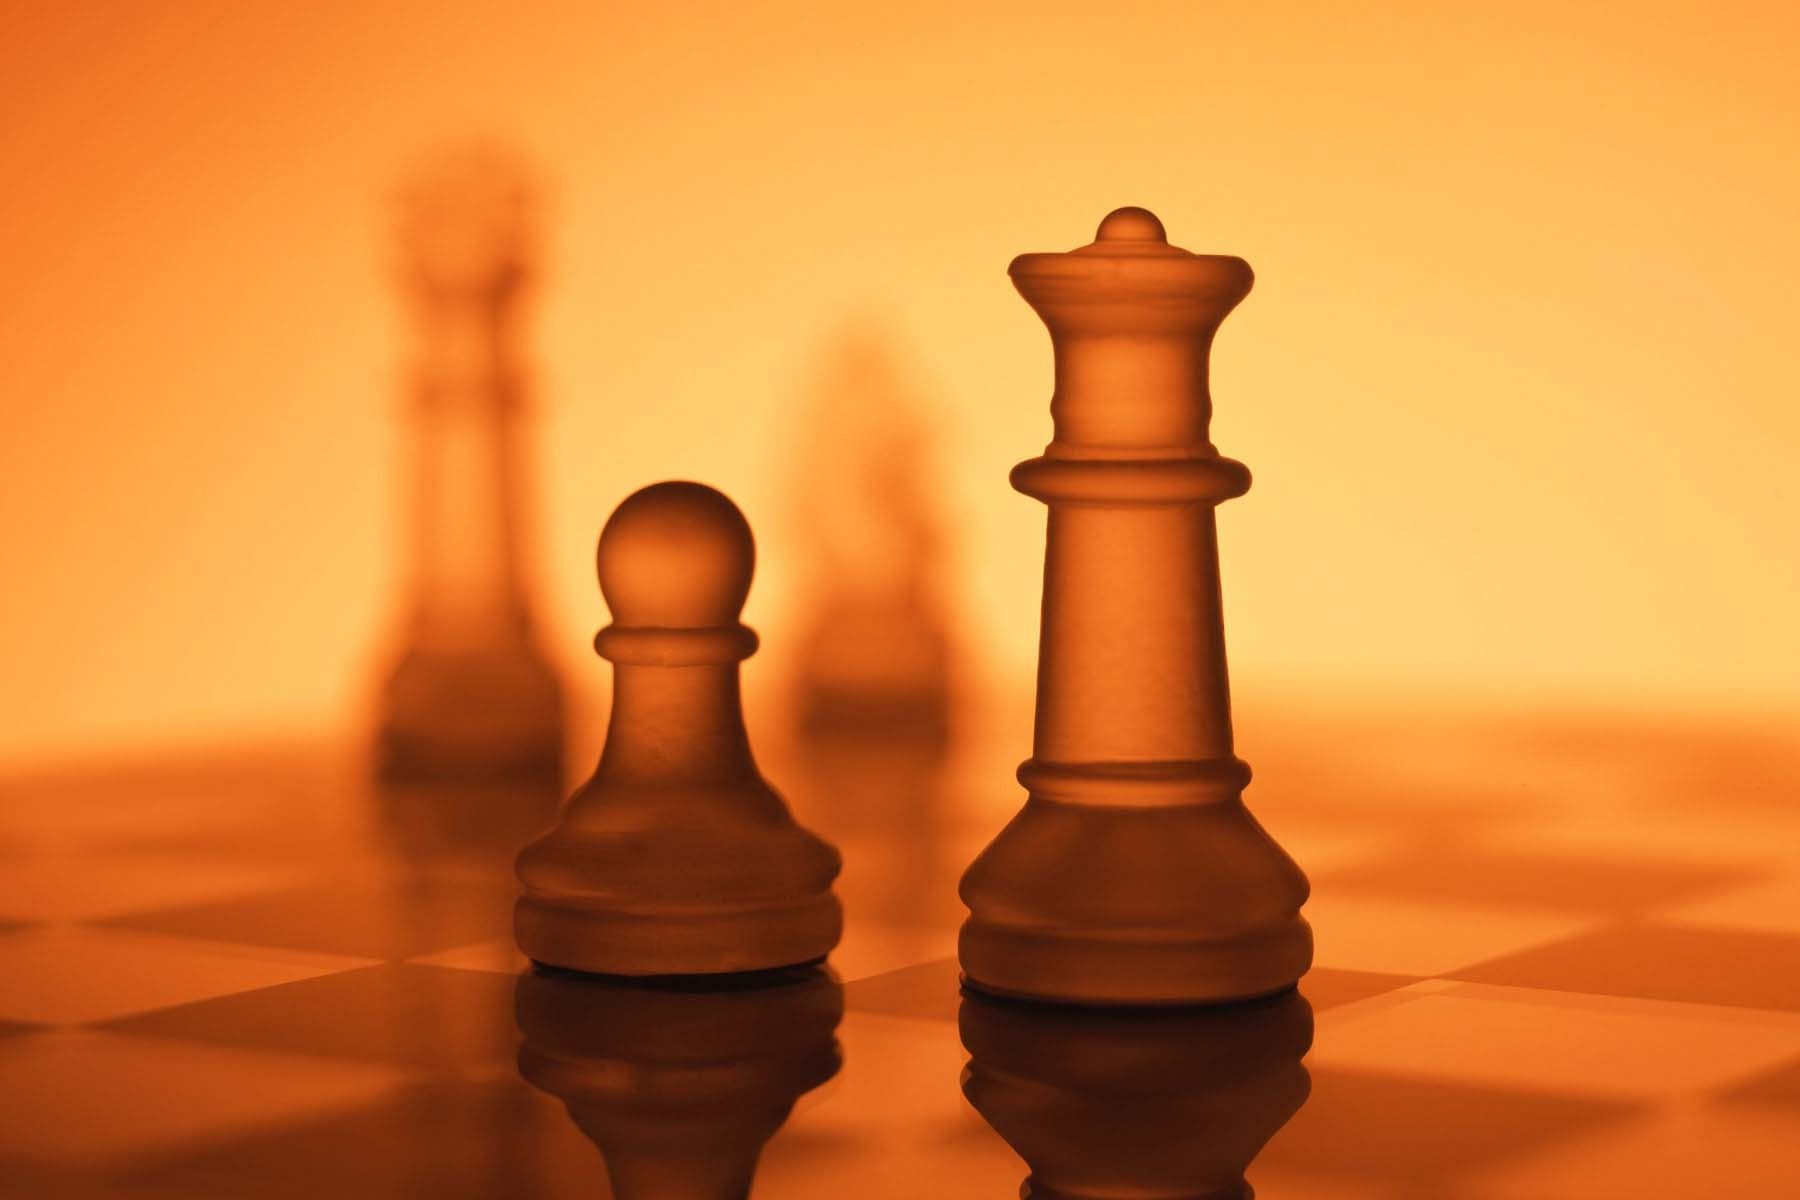 Glass chess set.jpg